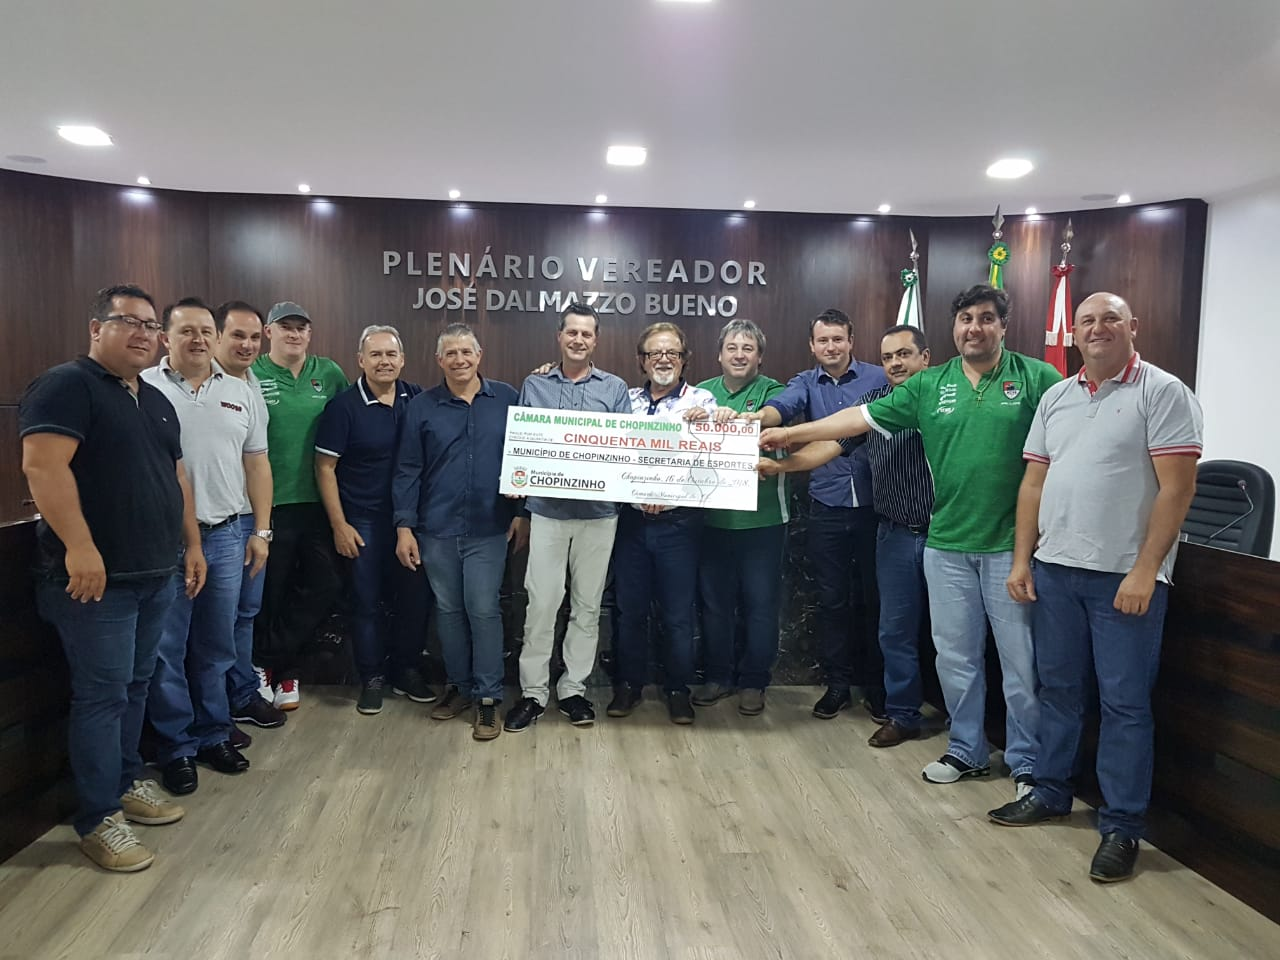 Câmara de Vereadores repassa cinquenta mil reais à Acel